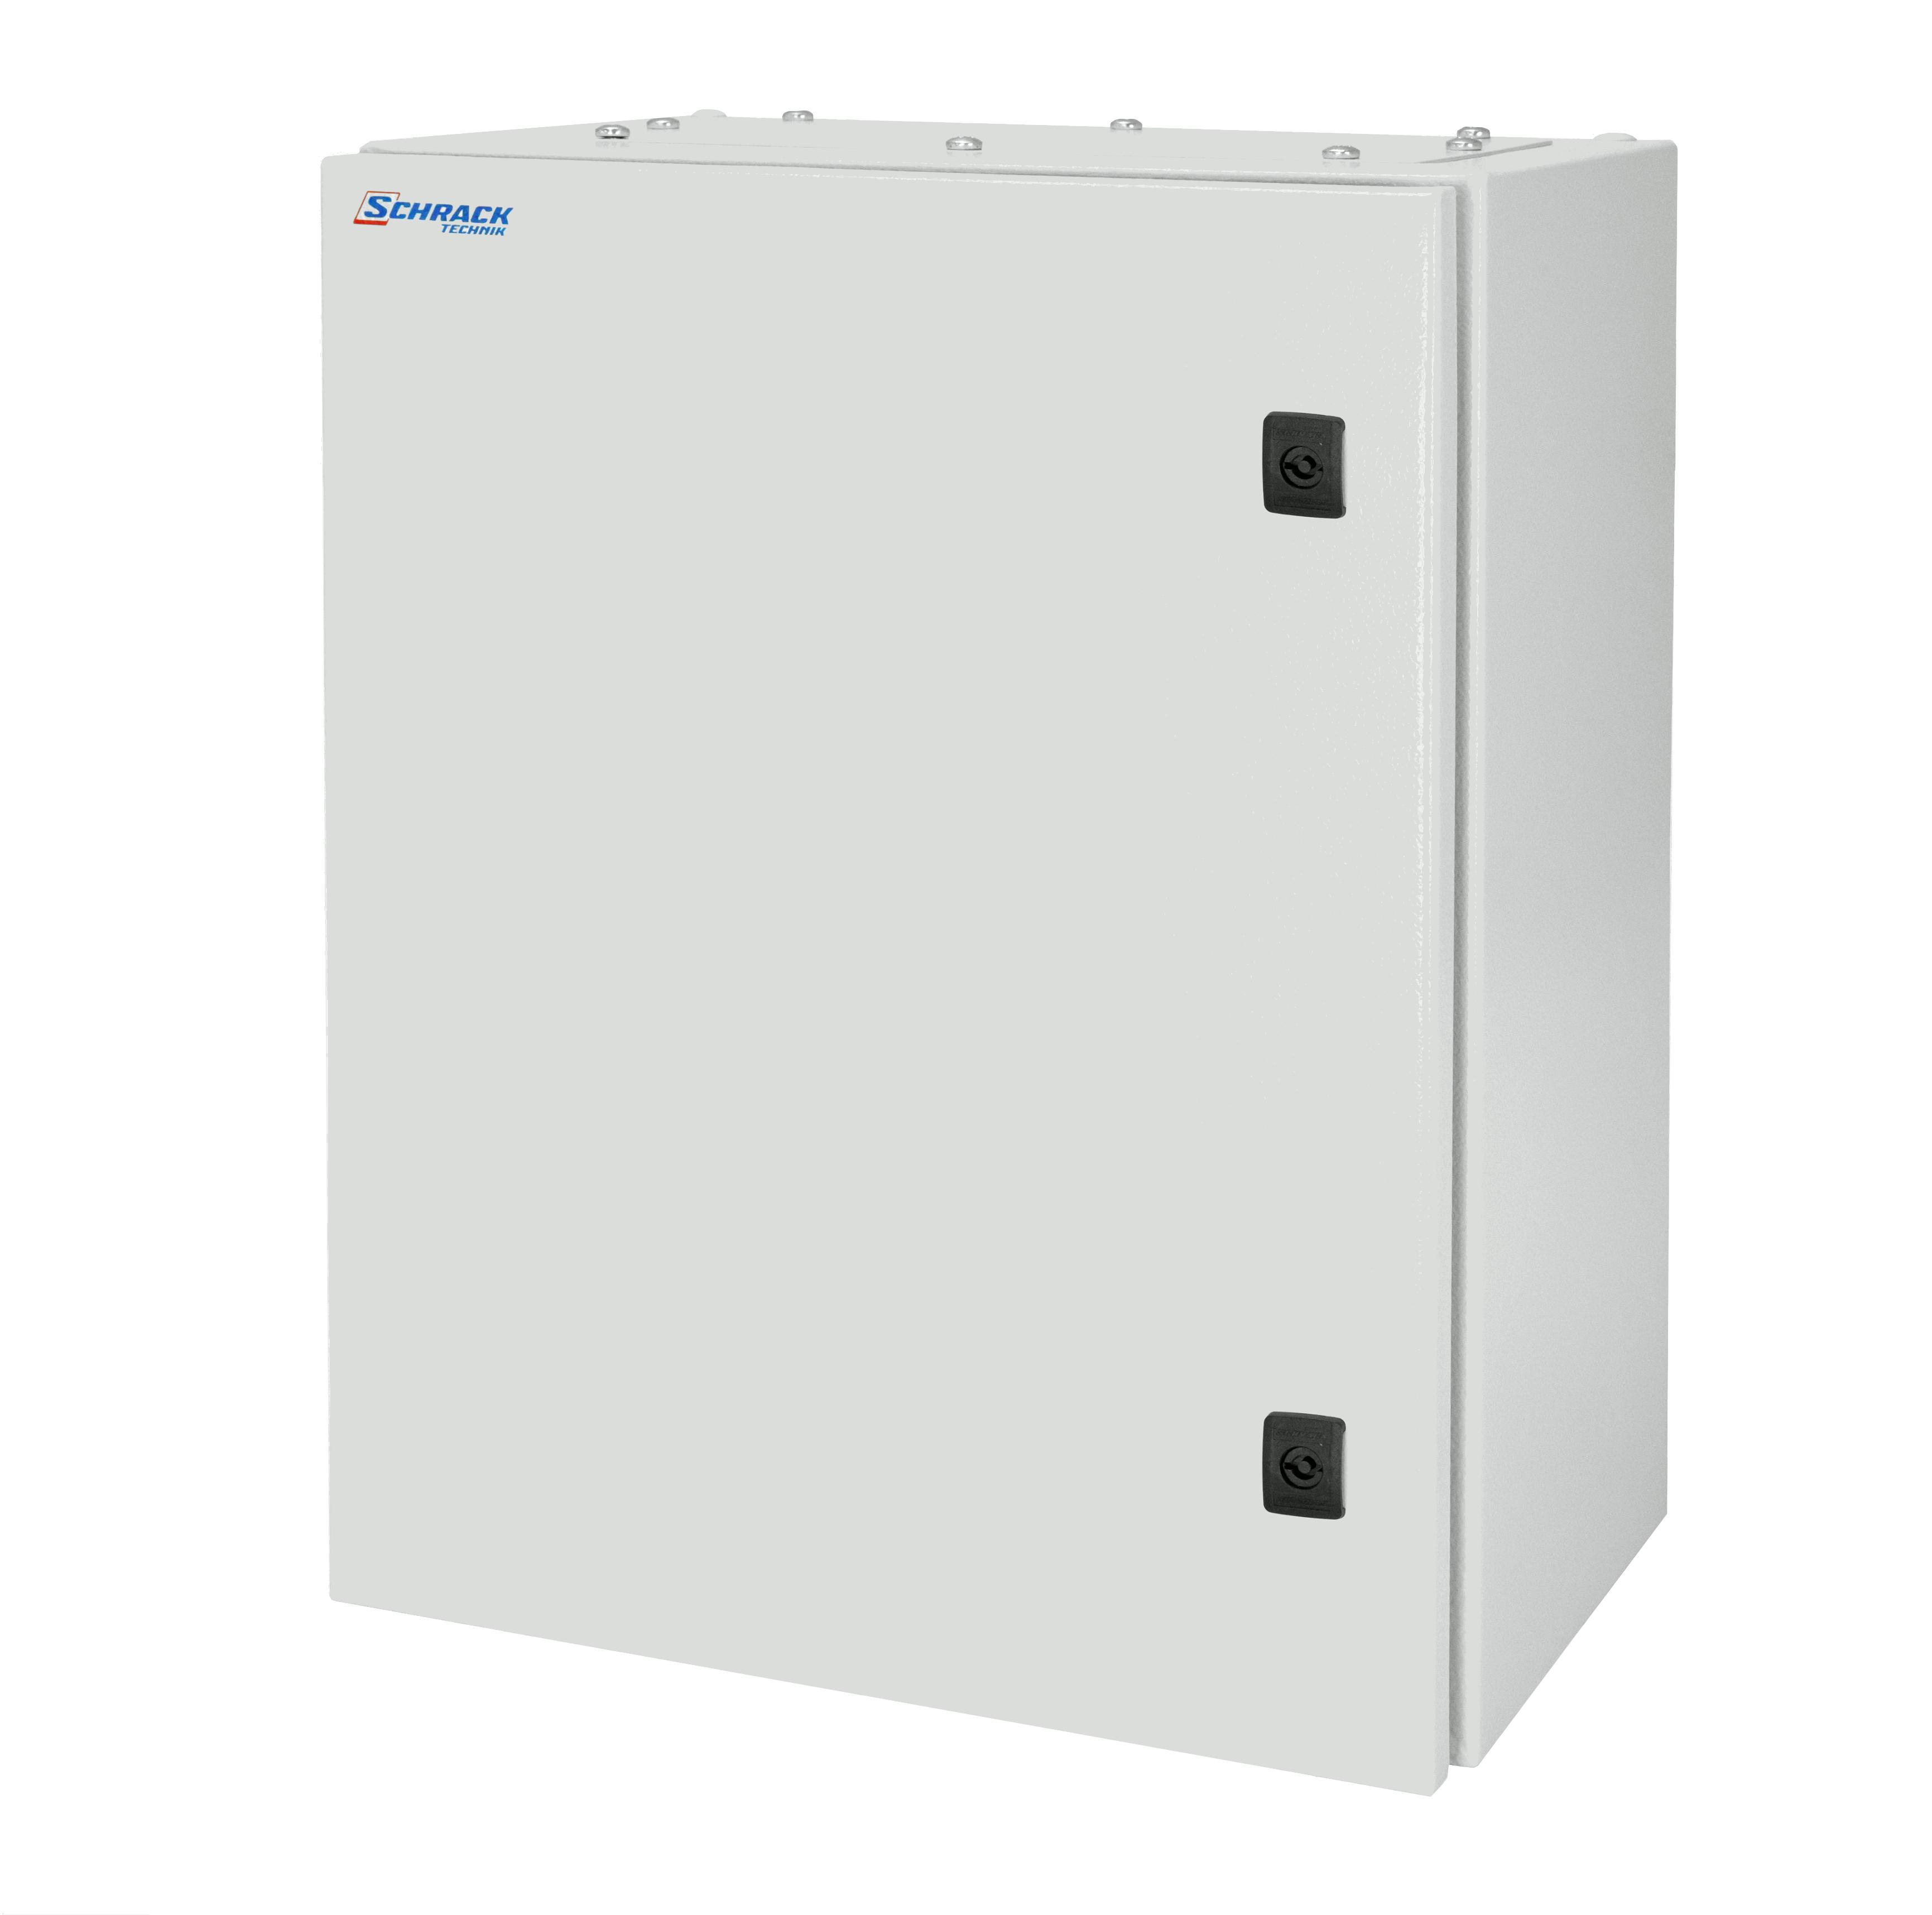 1 Stk Wandschrank Mono IP66 H=800 B=800 T=400 Stahlblech WSM8080400